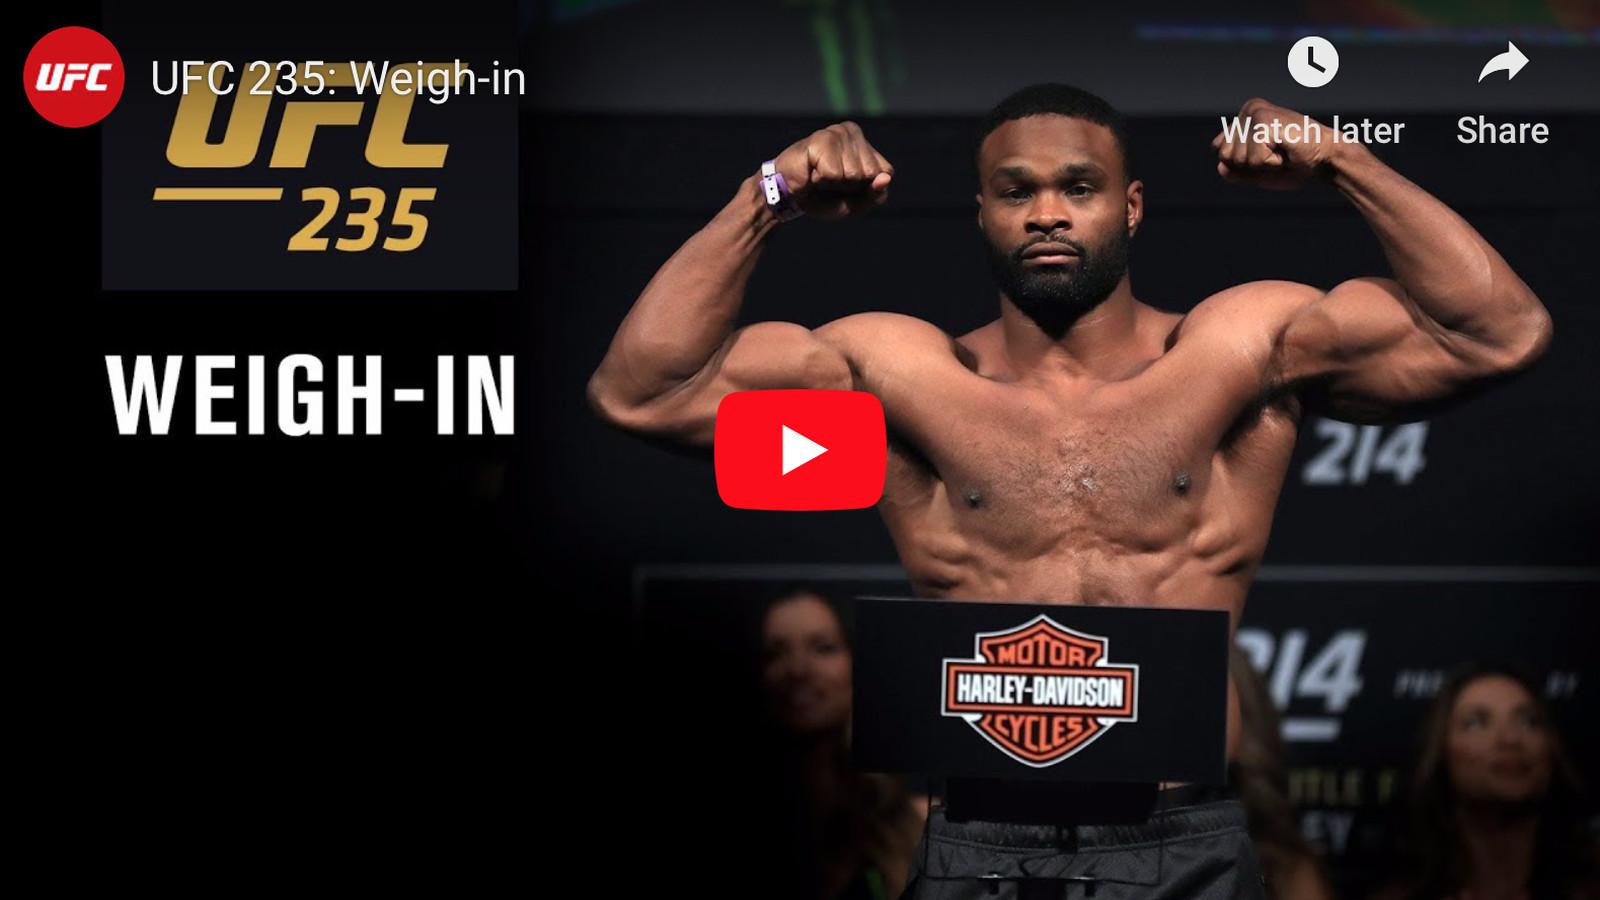 Live UFC 235 ceremonial weigh in video for Jones vs Smith in 1600x900